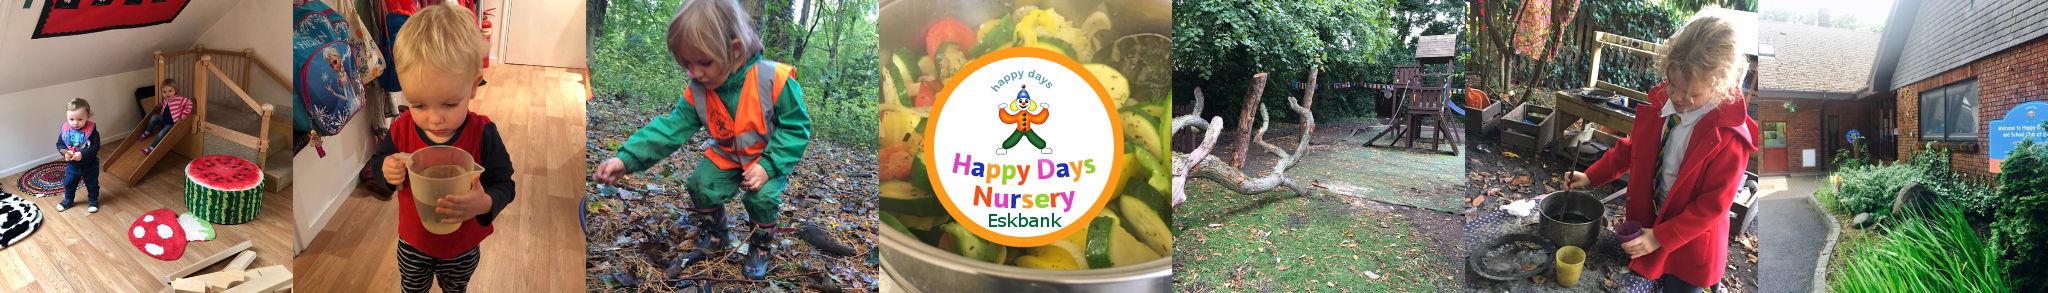 Happy Days Nursery Eskbank